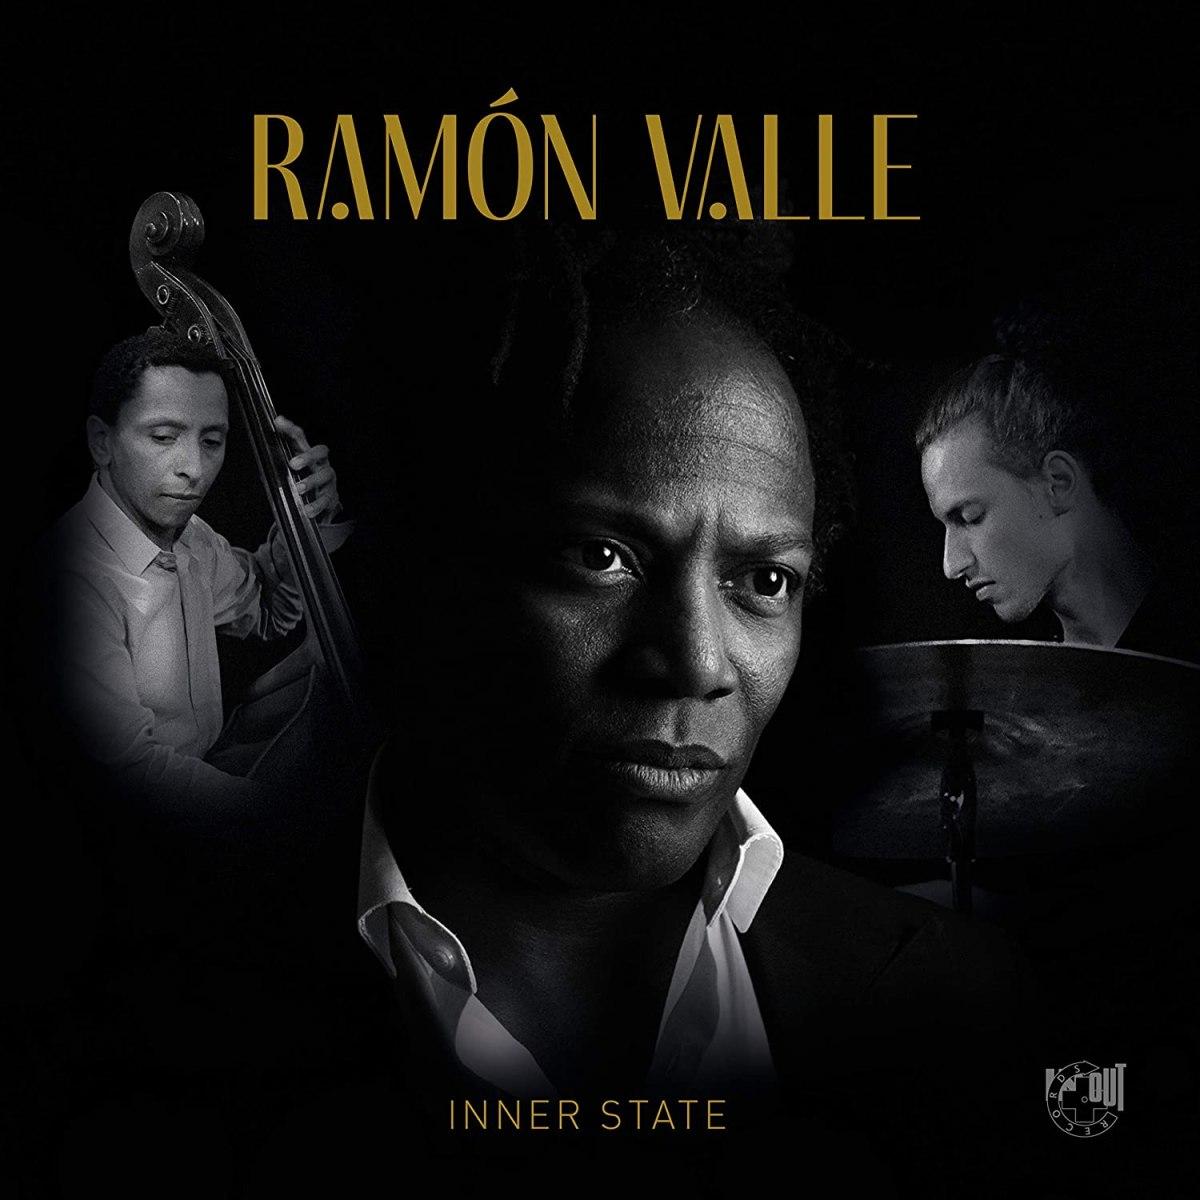 Cover Photo for Ramon Valle's new album Inner State